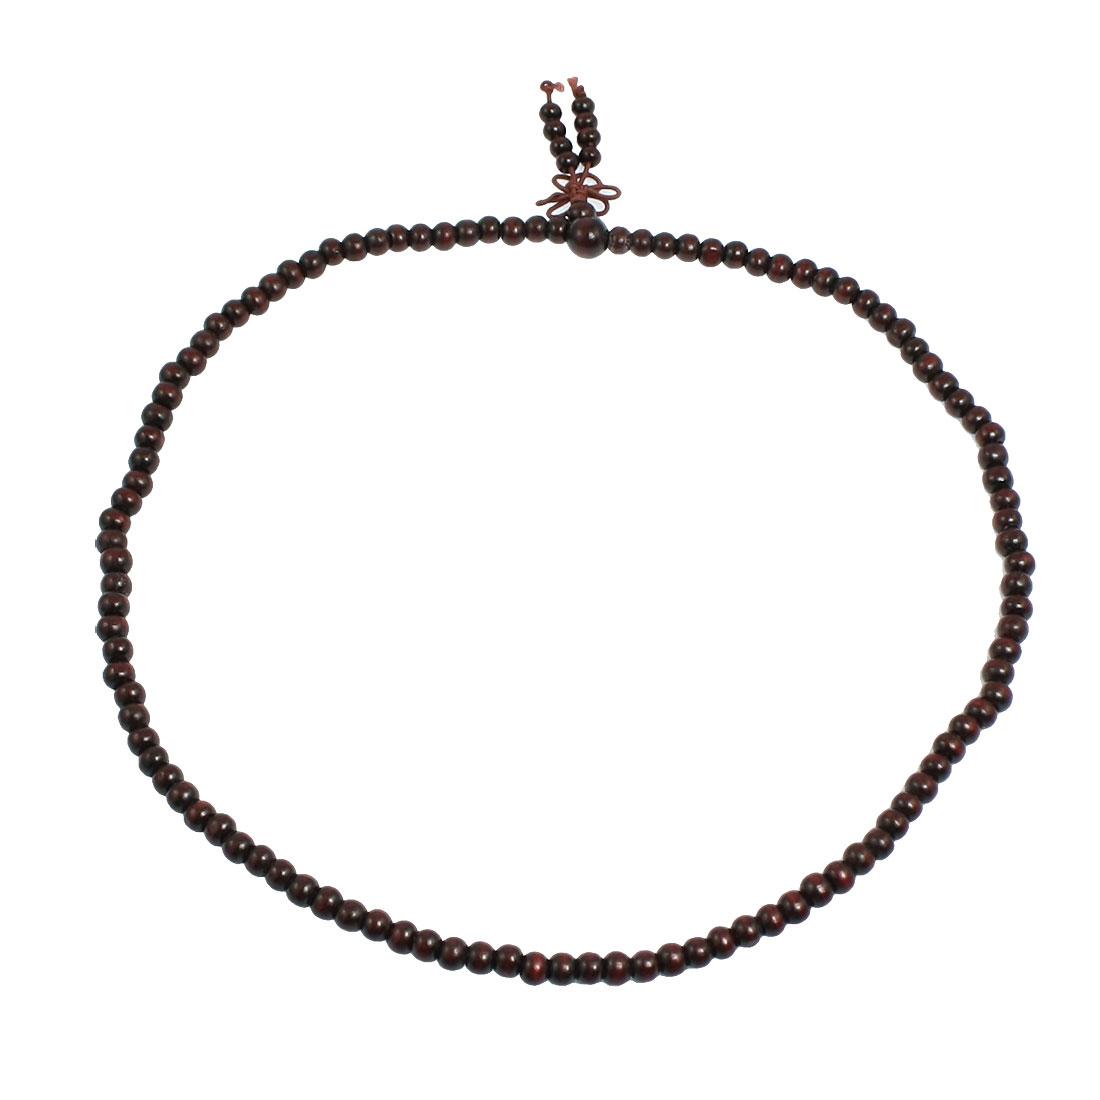 "21.6"" Girth Dark Red Wood Beads Chinese Character Bracelet Bangle"